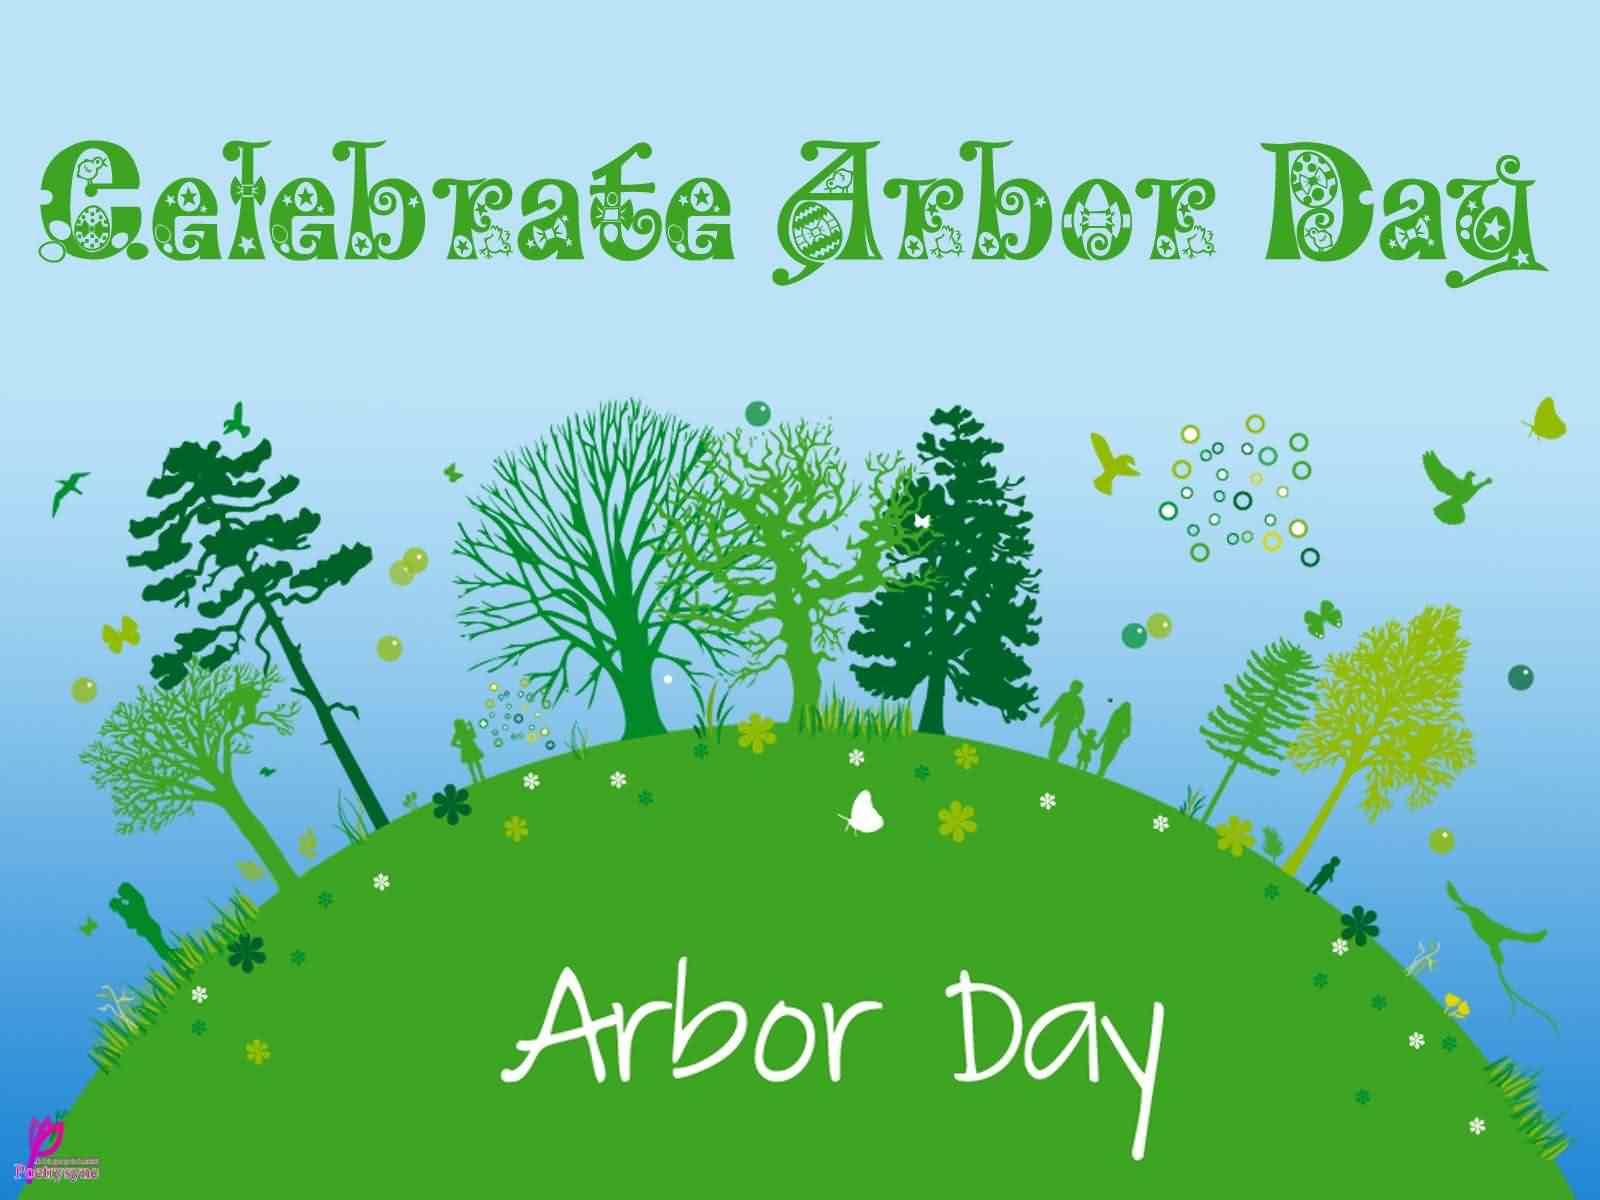 Arbor Day Poster Wallpaper